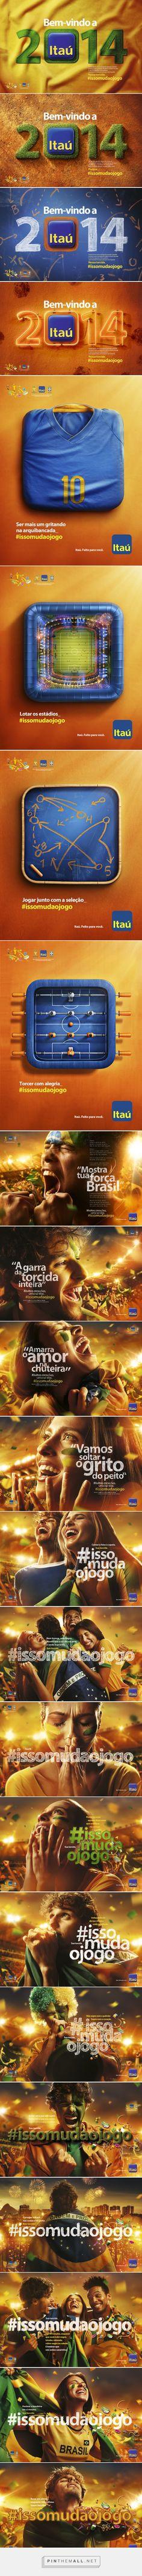 Copa do Mundo 2014 - Iron Brito. Advertising Sales, Advertising Poster, Tool Design, Web Design, Graphic Design, Banners, Identity Development, Ads Creative, Advertising Photography